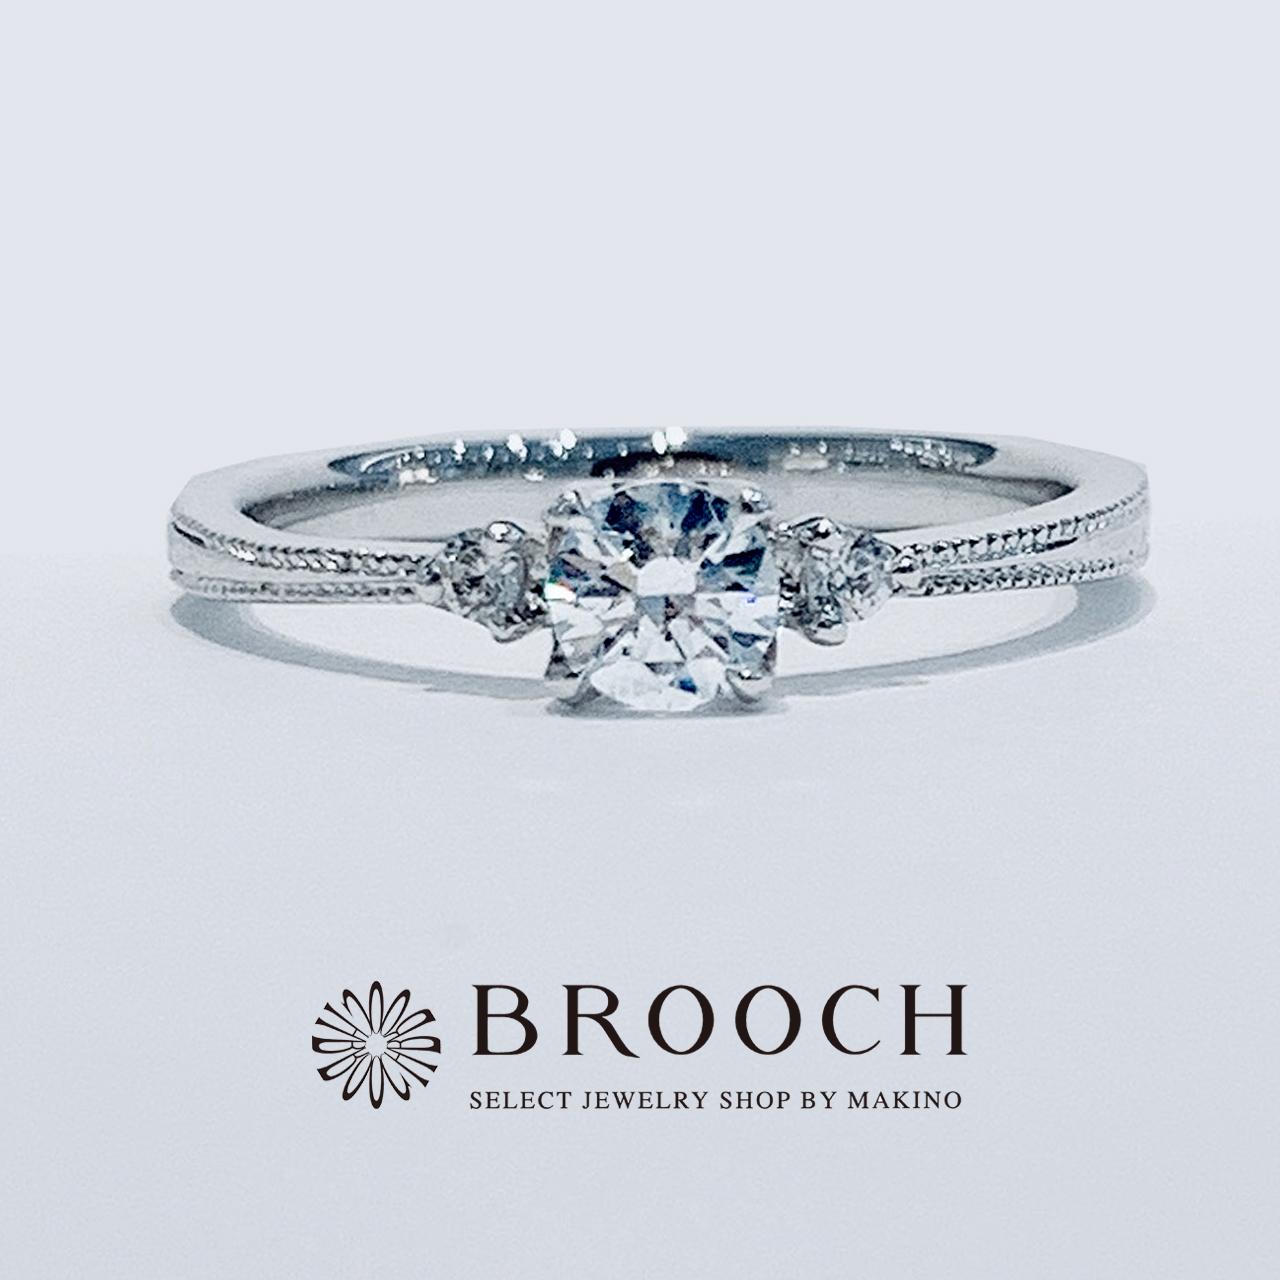 BROOCH 婚約指輪 エンゲージリング シンプル両サイドメレミル打ちデザイン